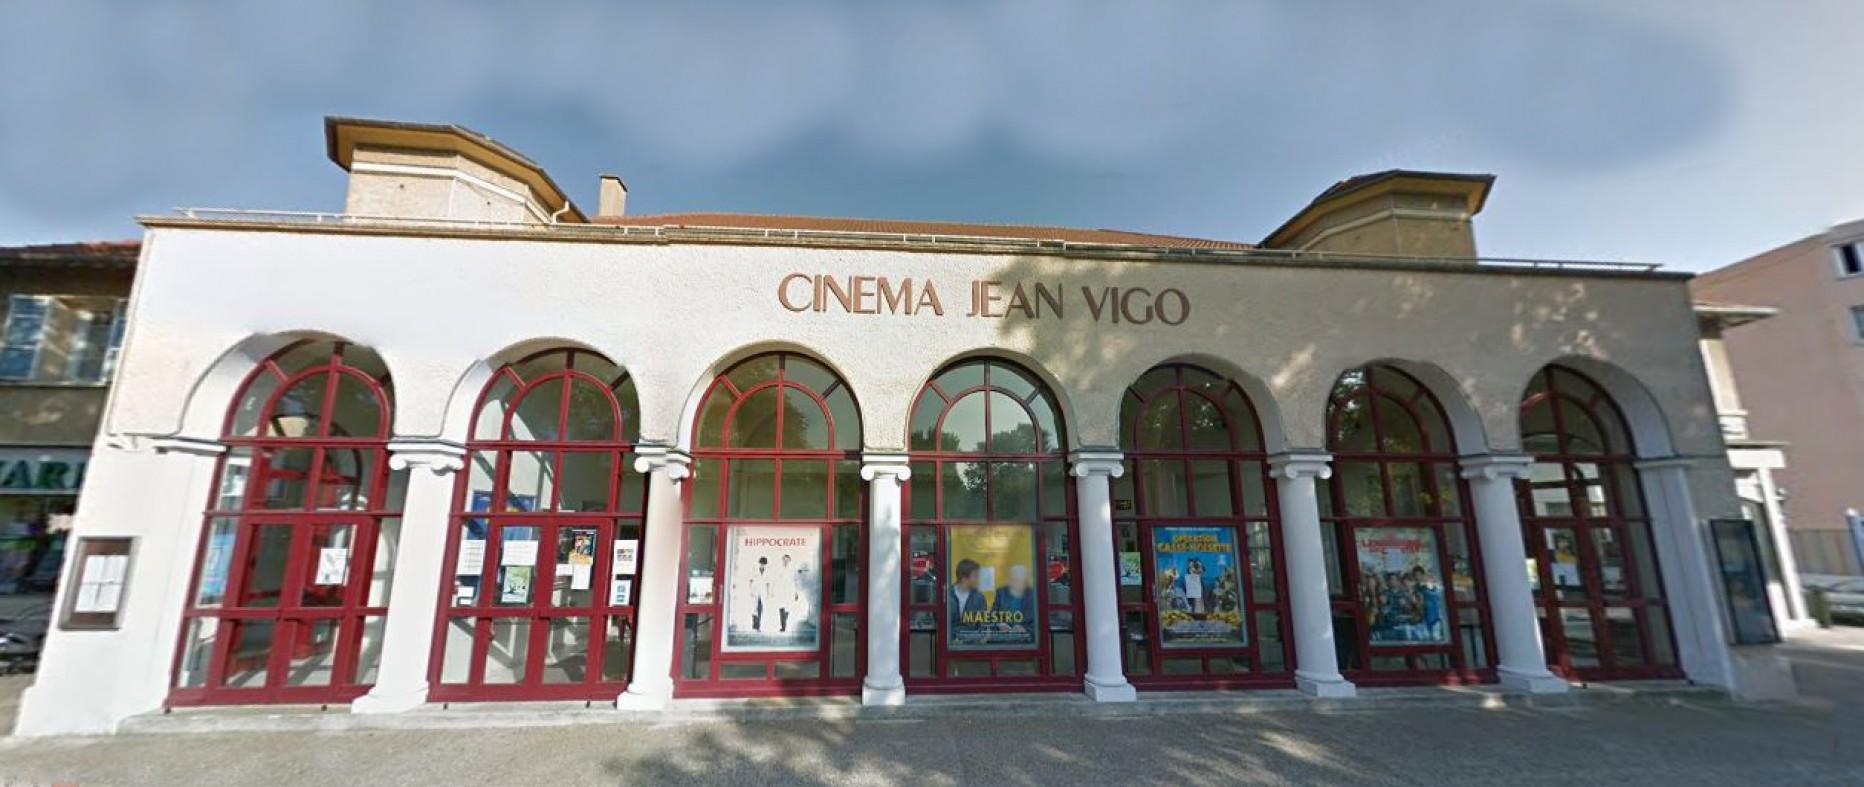 Cinéma Jean-Vigo